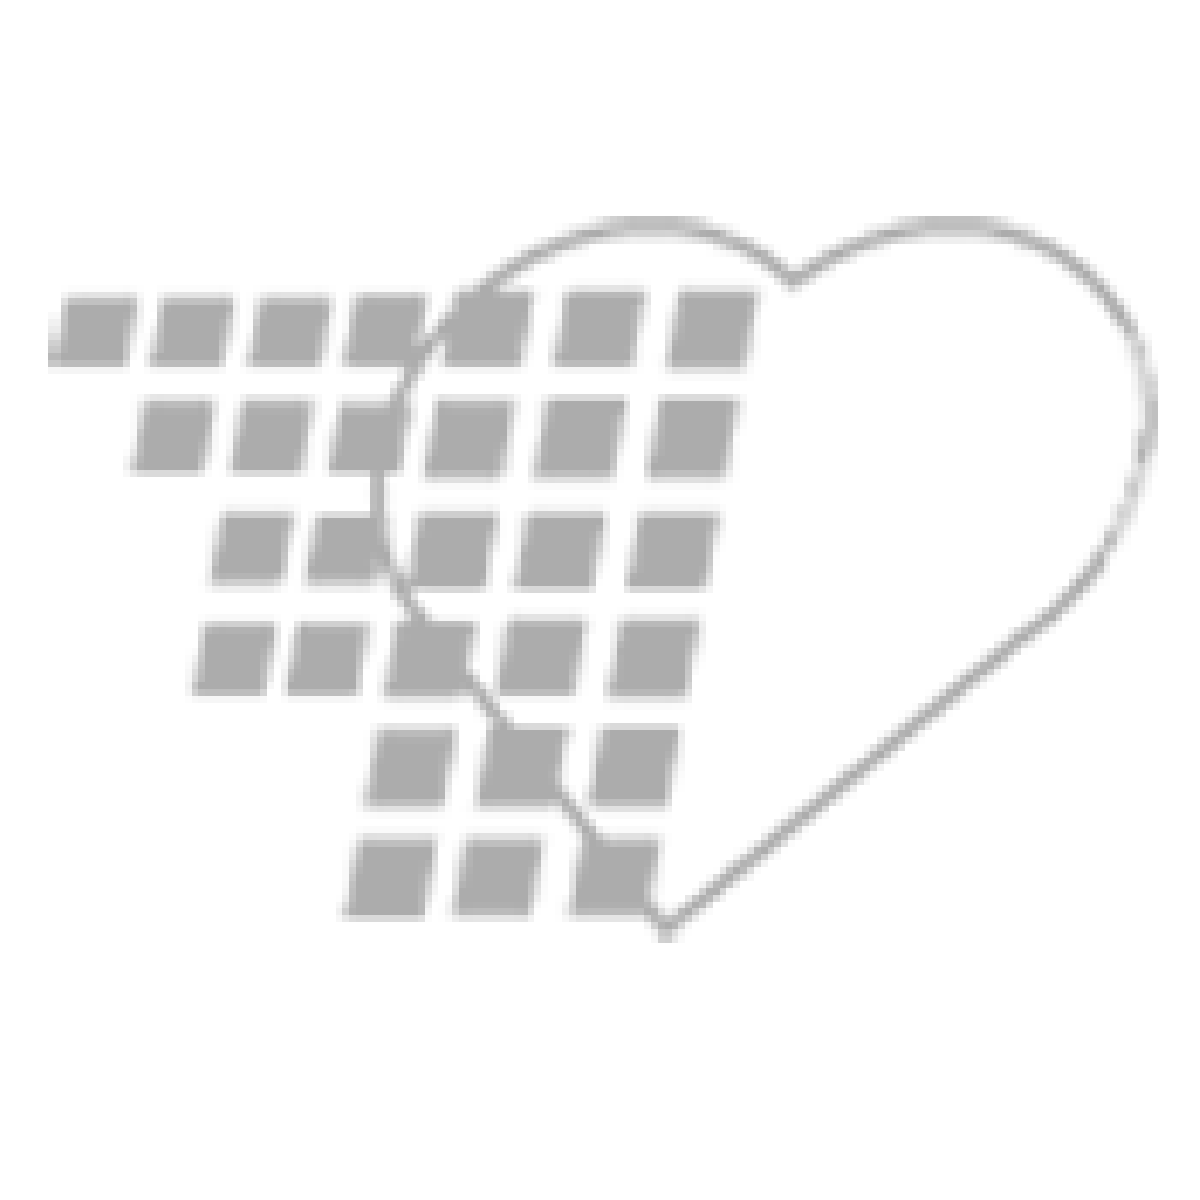 e6ebbd998f1 03-85-8060 Innovative Healthcare Corporation DermAssist® Dry Wipes